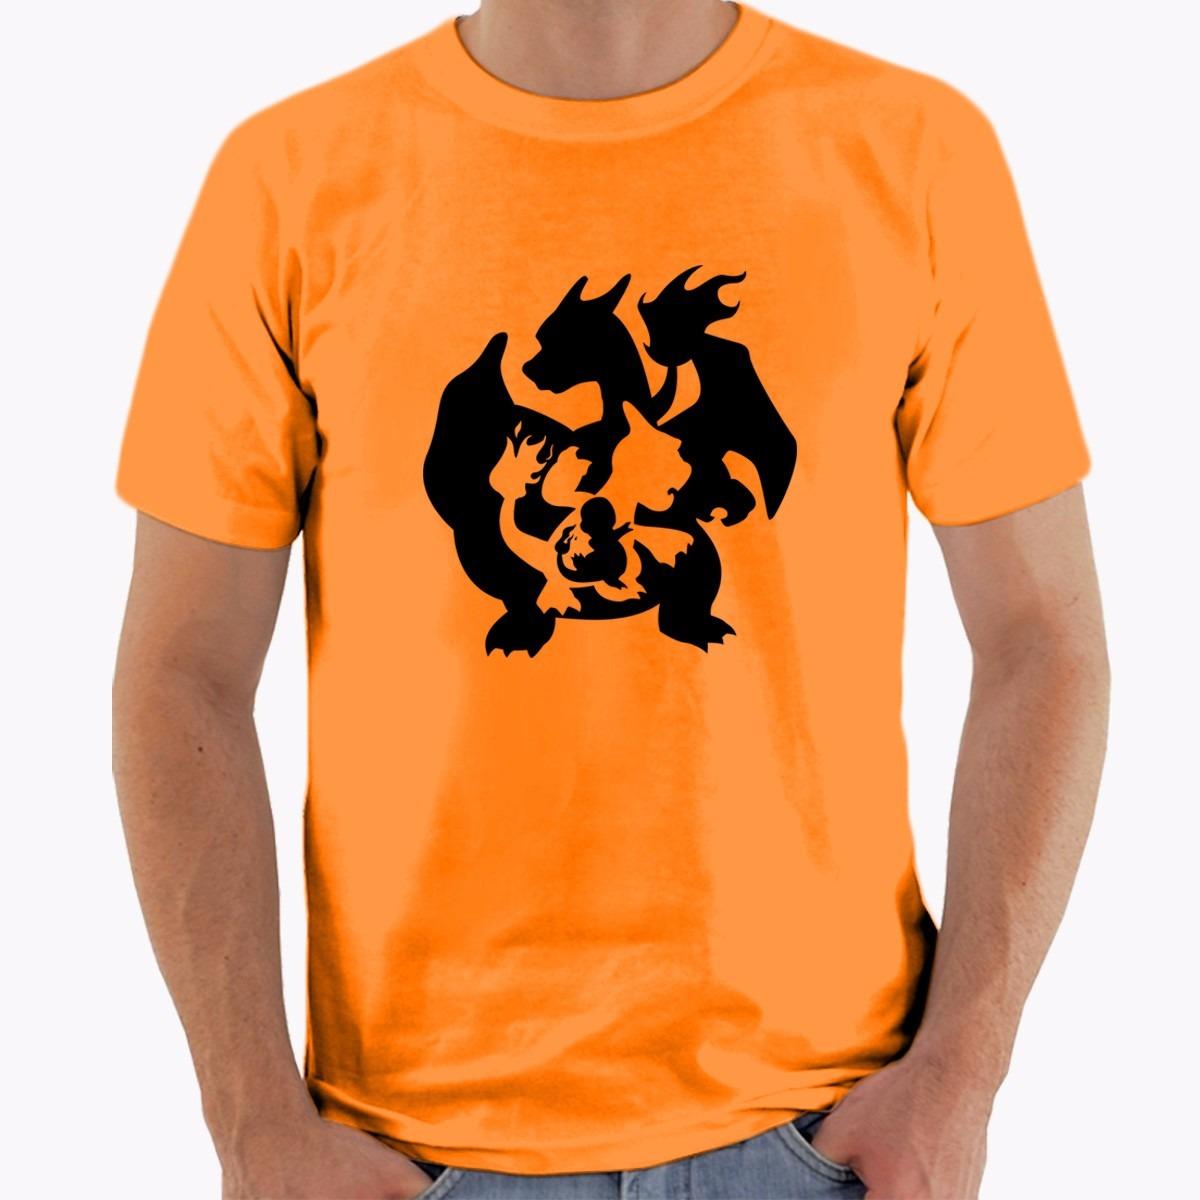 65bc39ac ... T Shirt Source · Camiseta Pokemon Charmander Evolution Charmeleon  charizard R 40